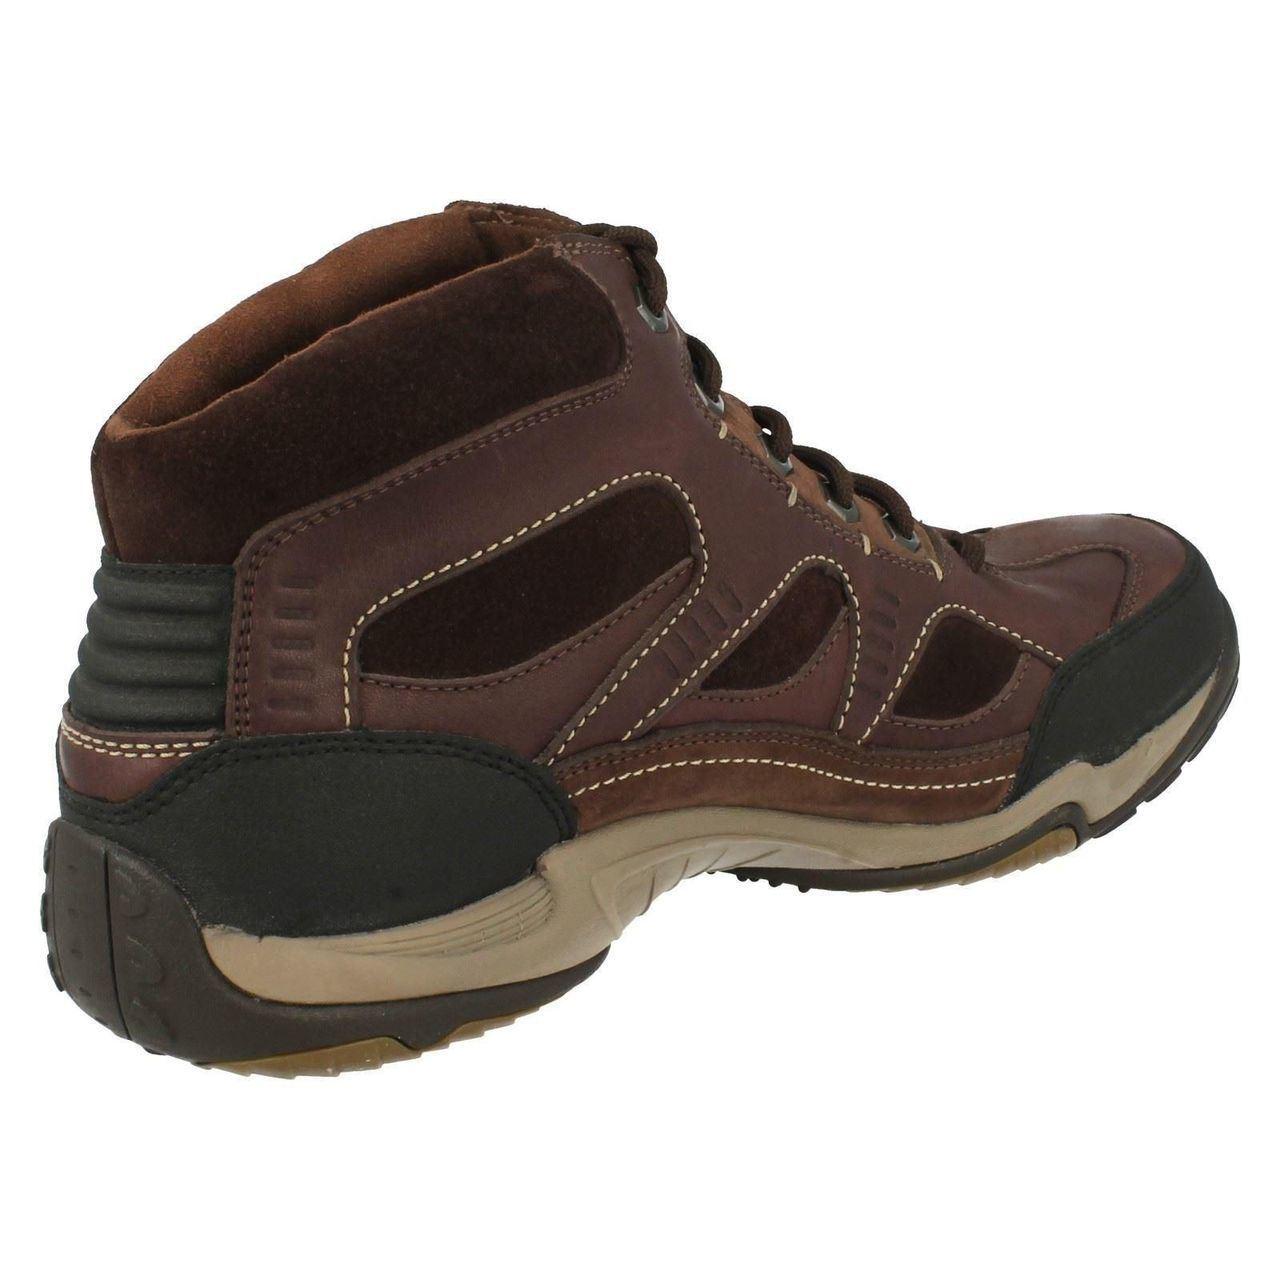 Gtx' 'rodwing marrone Clarks Gore Ebony K ~ Mens Boots impermeabile tex 7wpqpS